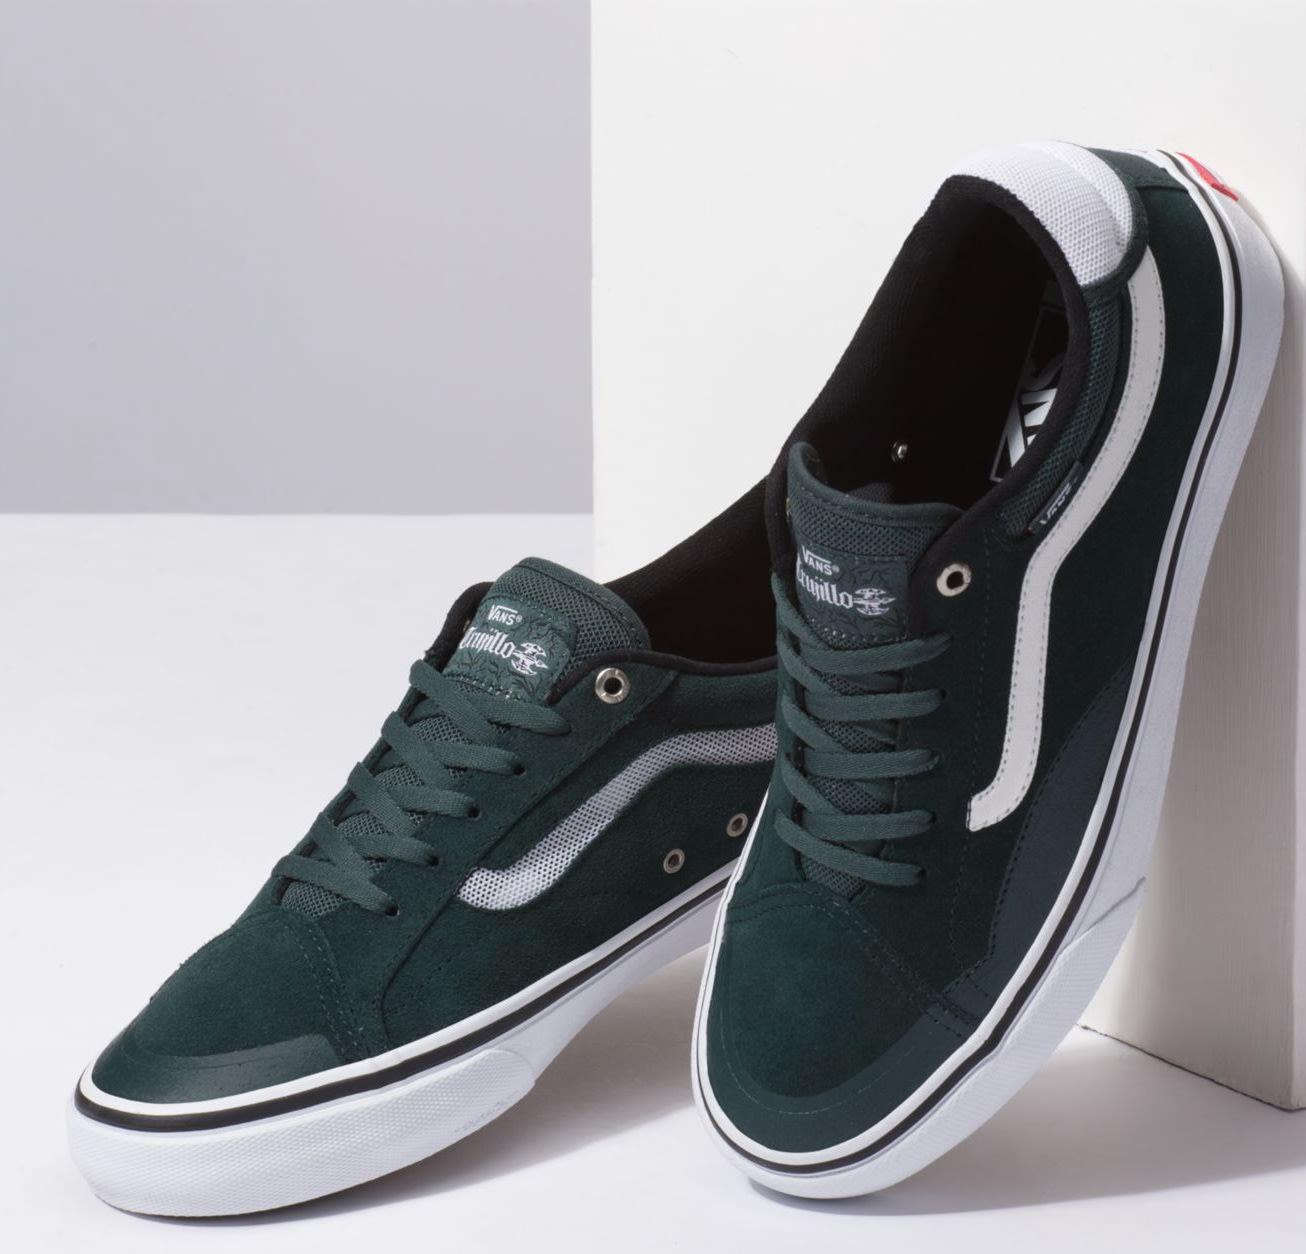 658c338750 Vans TNT Advanced Prototype Skate Shoes - thumbnail 2